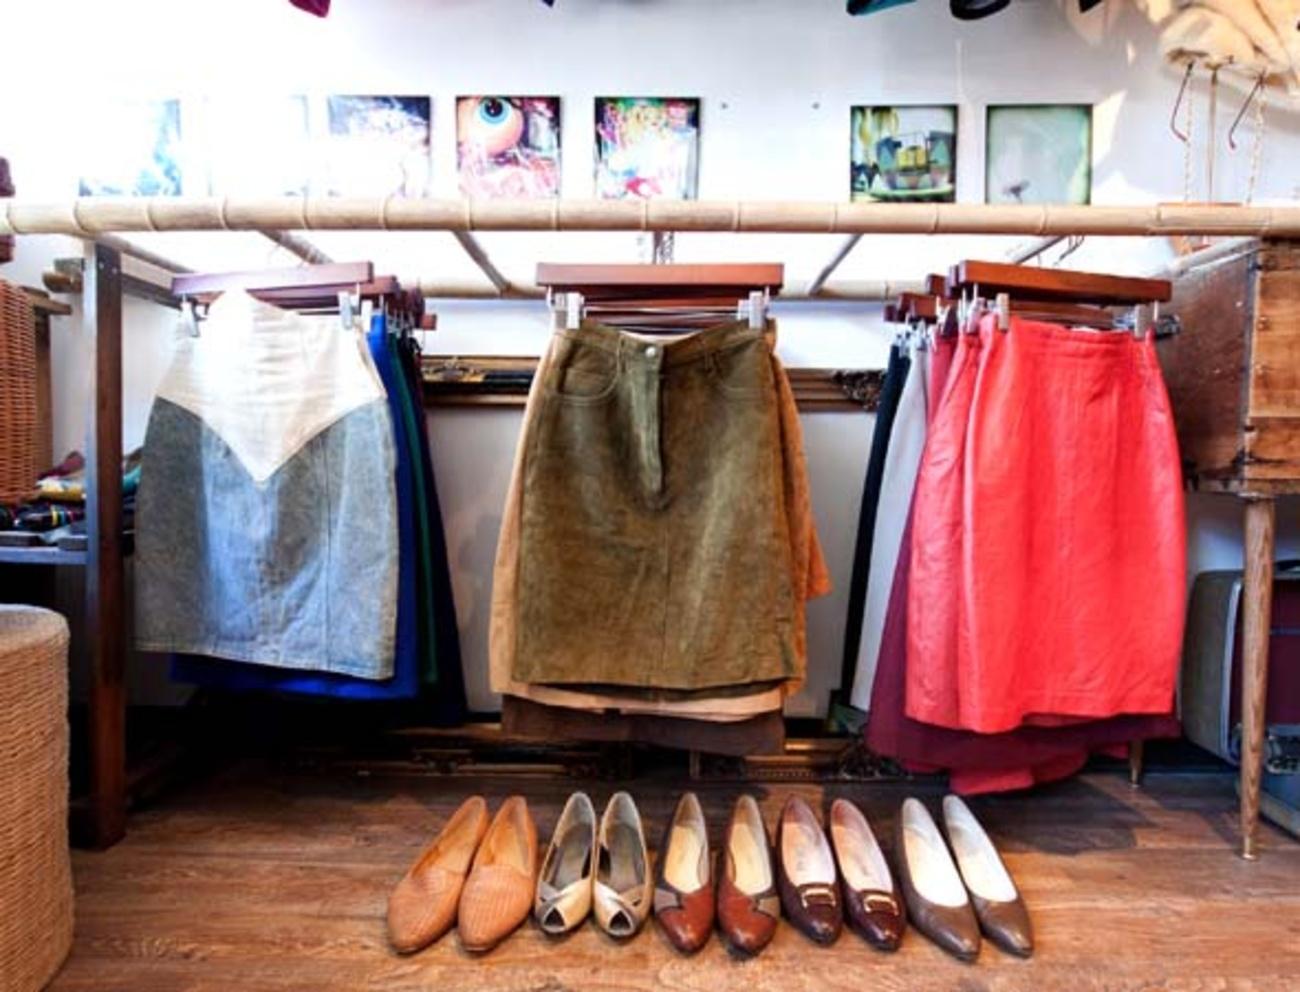 American Apparel expats open vintage shop in Kensington Market